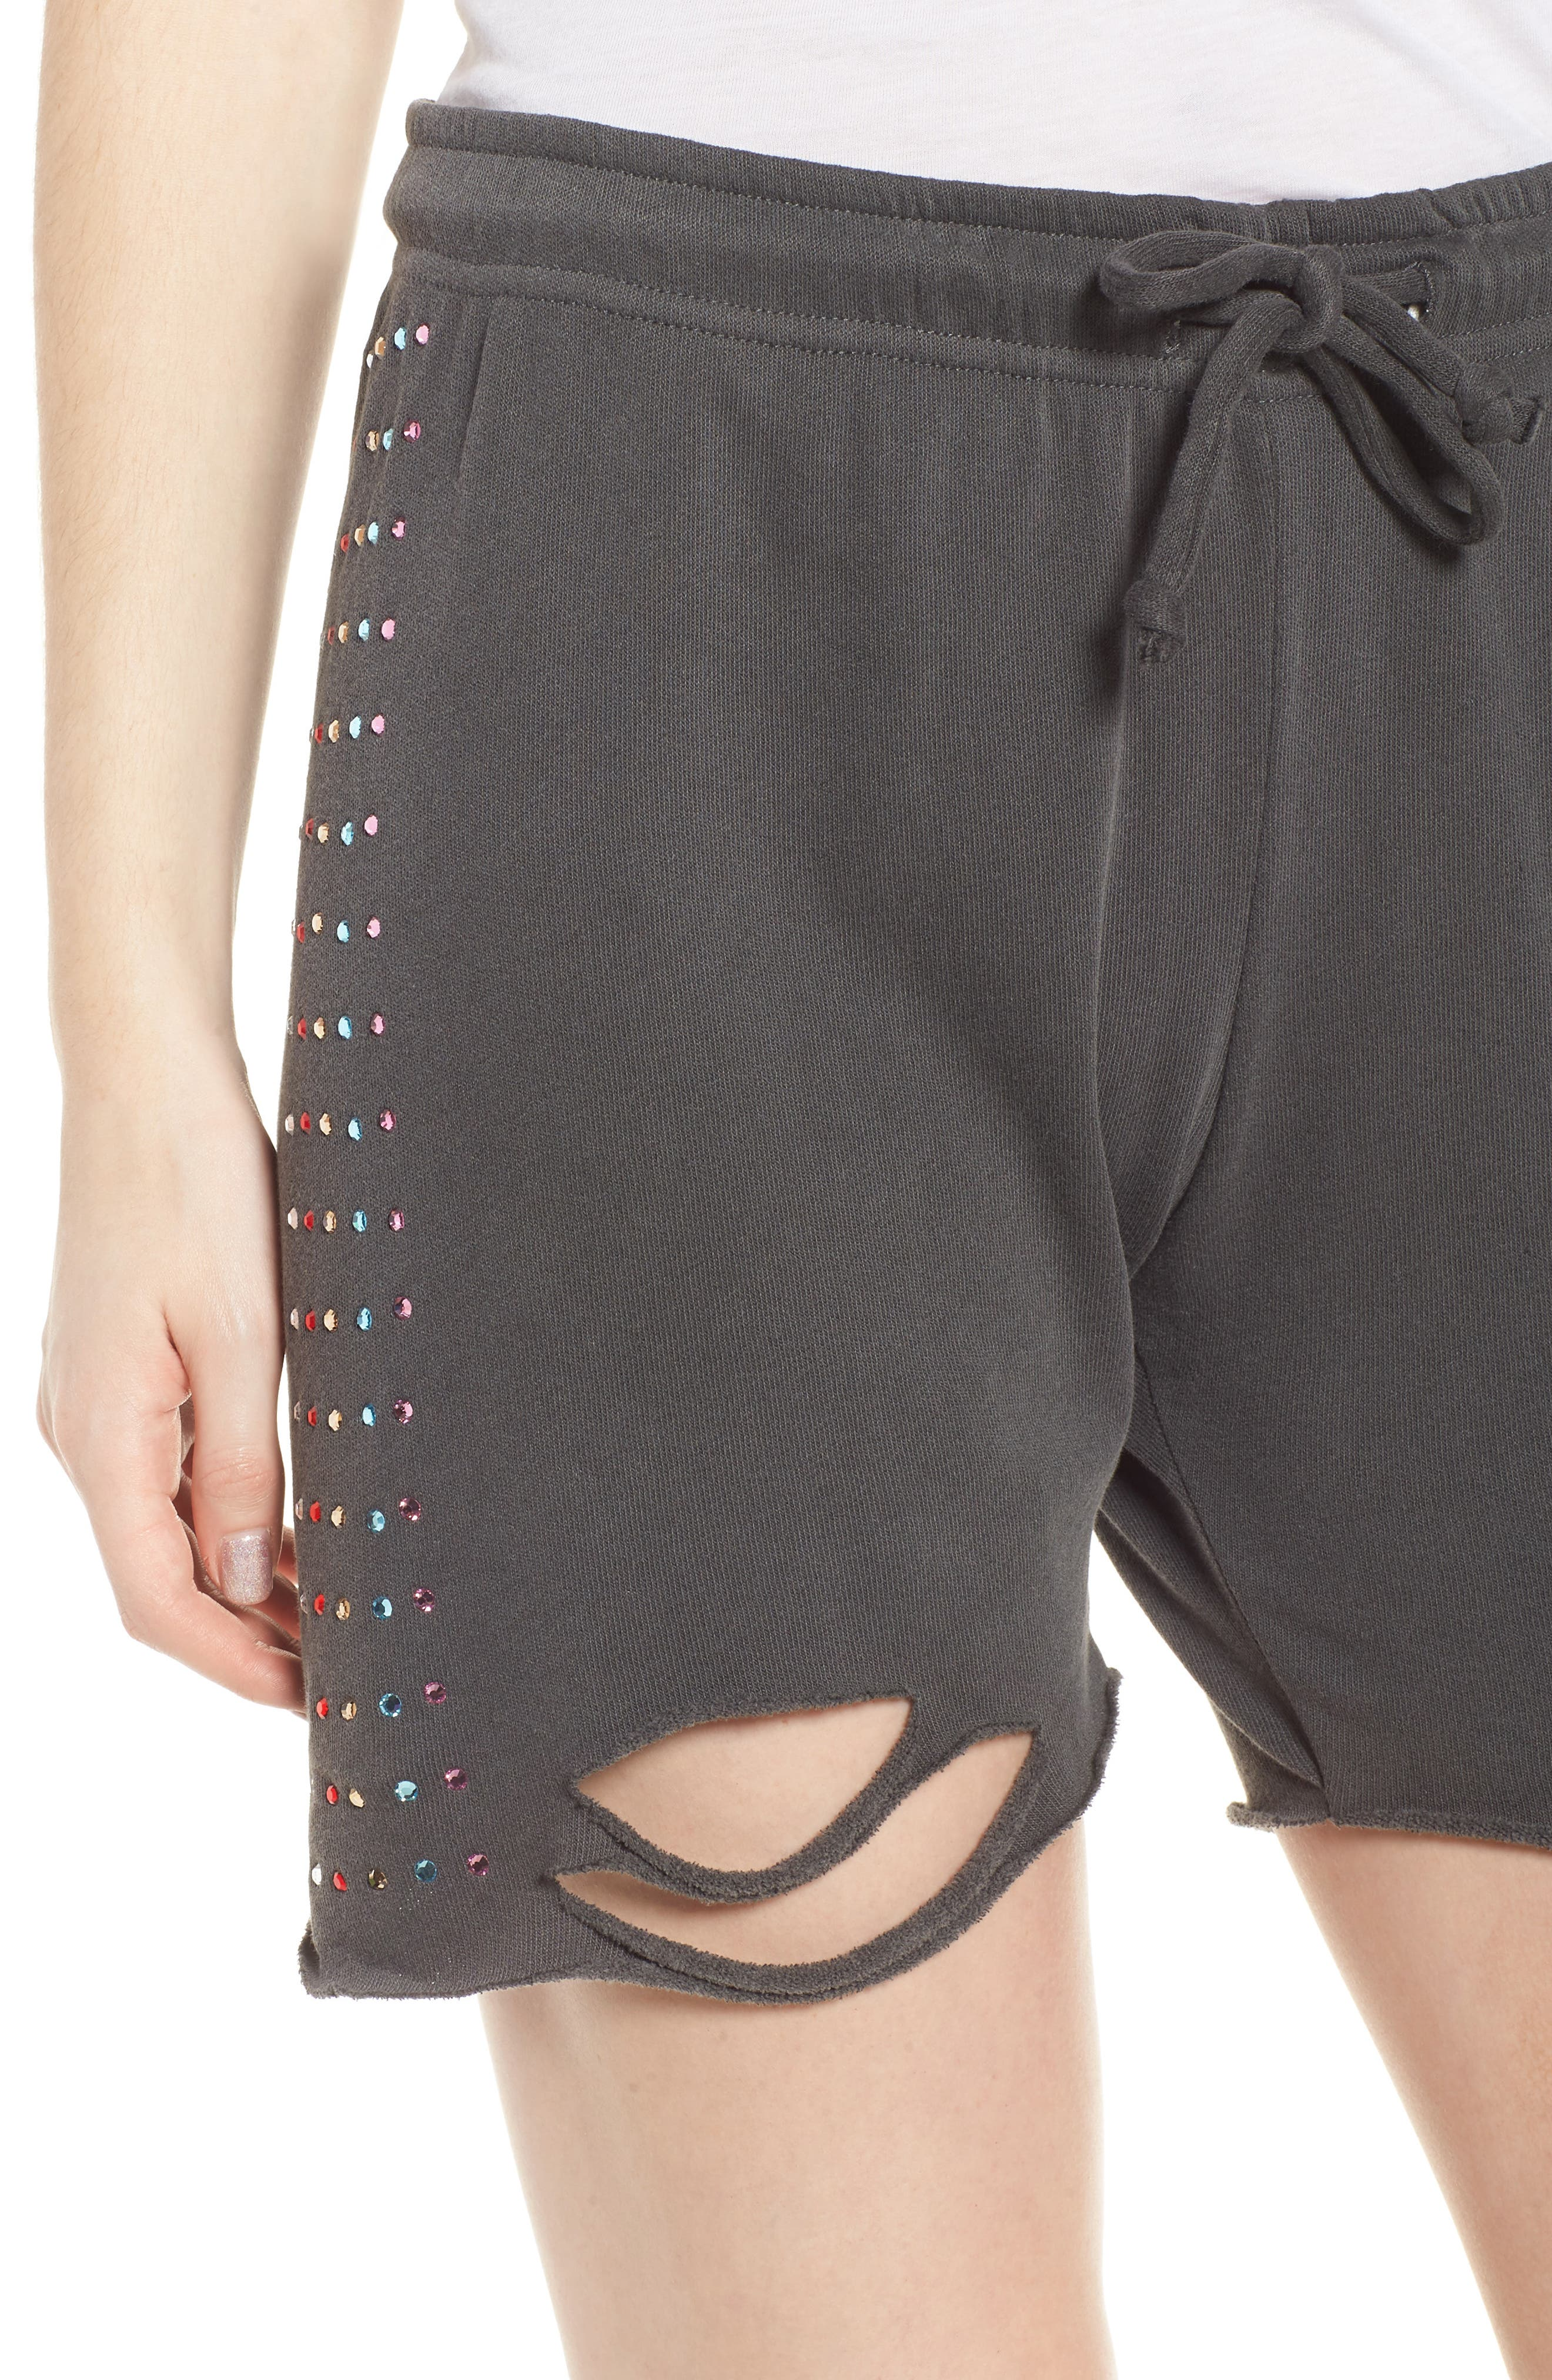 Rainbow Glitz Shorts,                             Alternate thumbnail 4, color,                             Pigment Black